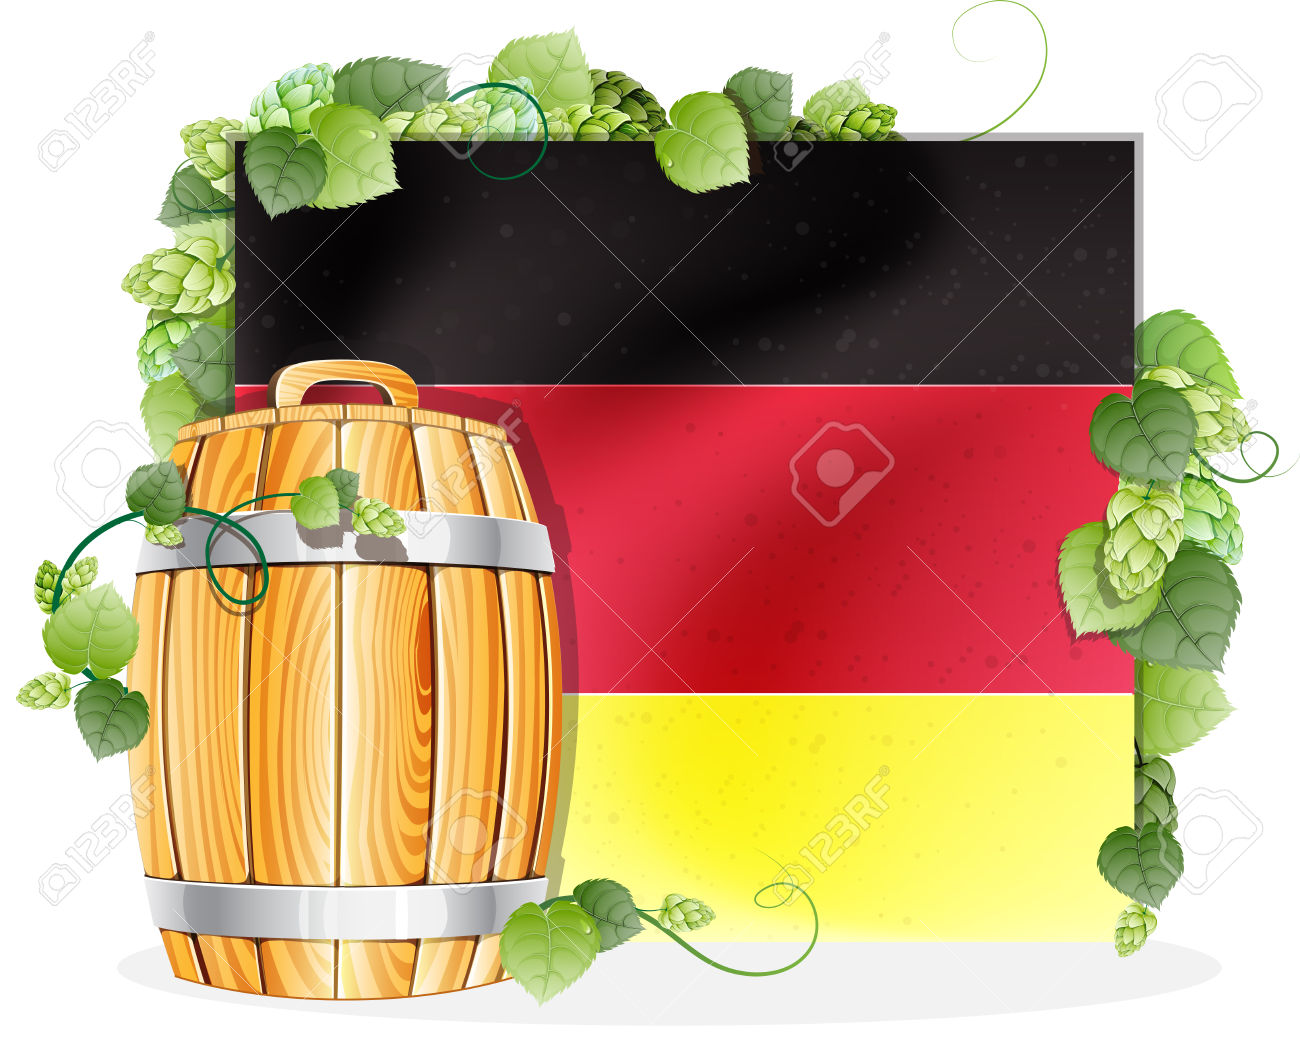 Oak Wooden Beer Barrel On The Background Of The German Flag.